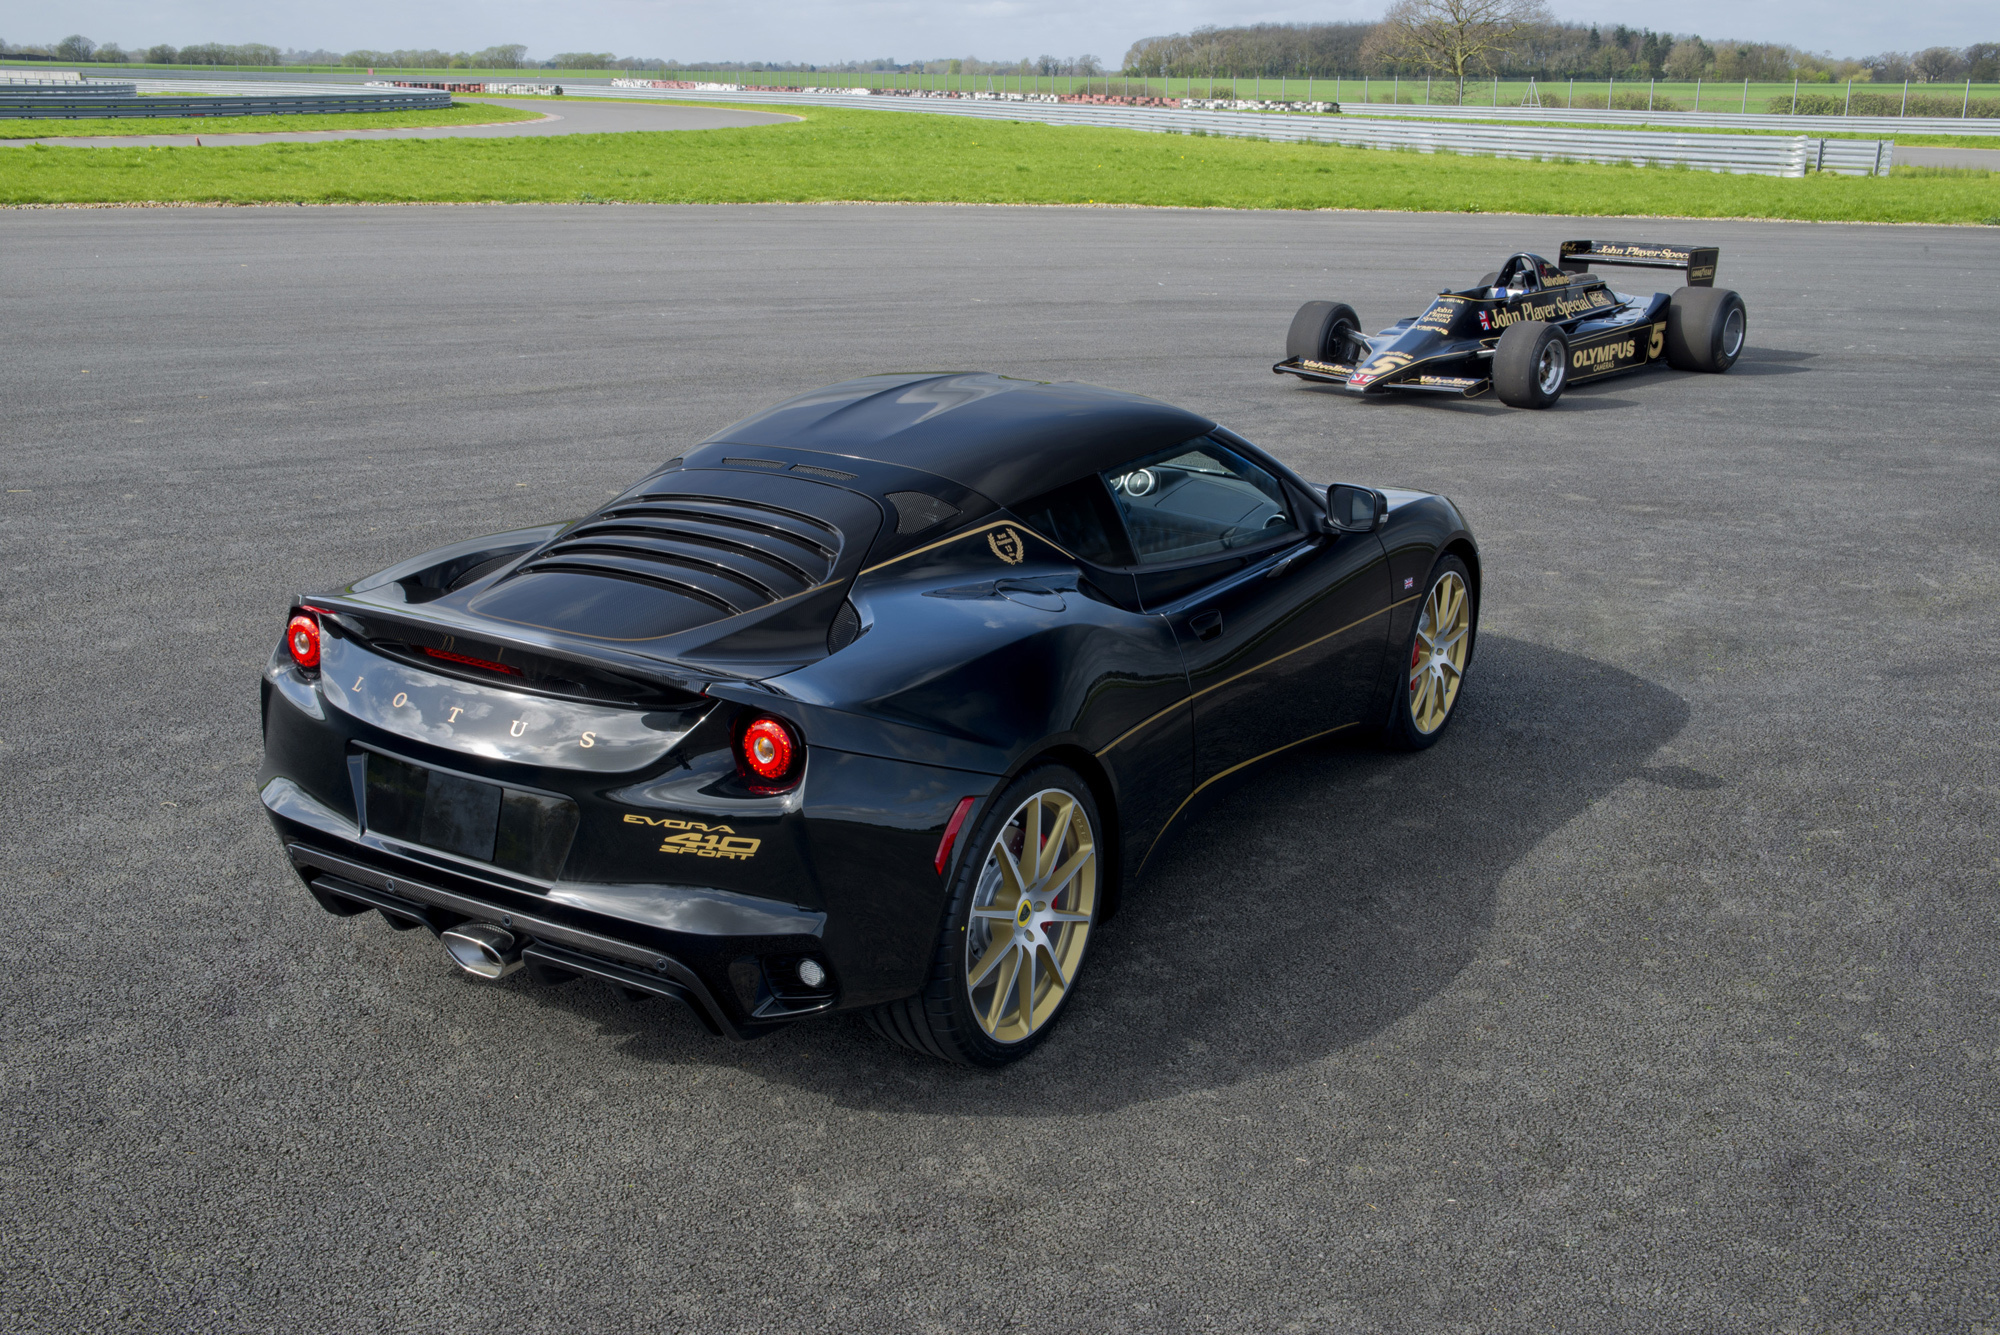 Lotus Evora Sport 410 Gp Wallpapers Images Photos Pictures